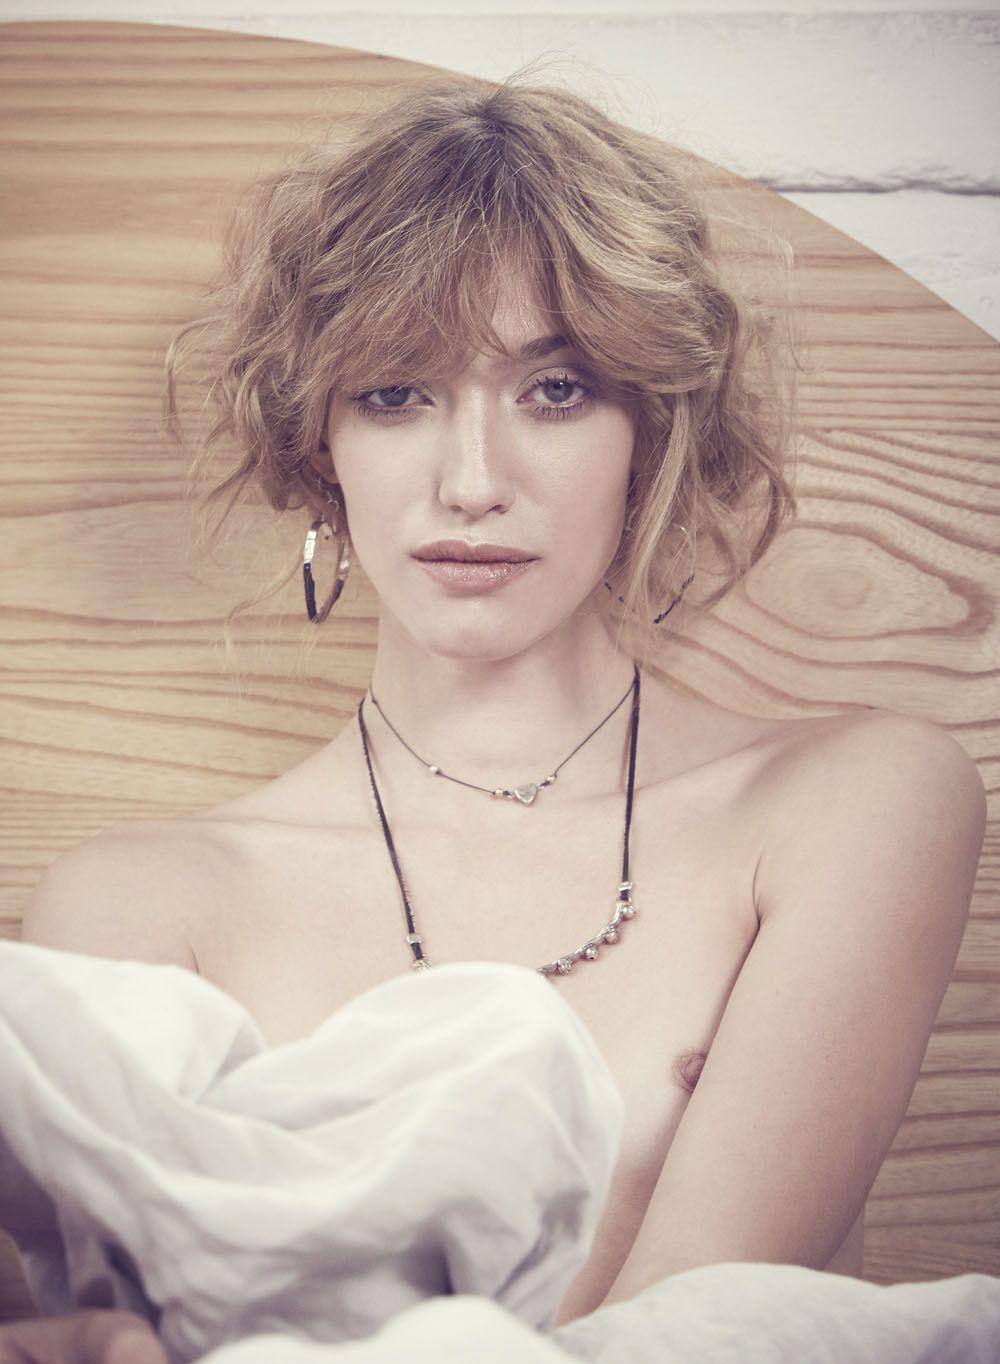 Topless Pics Of Dana Alma...